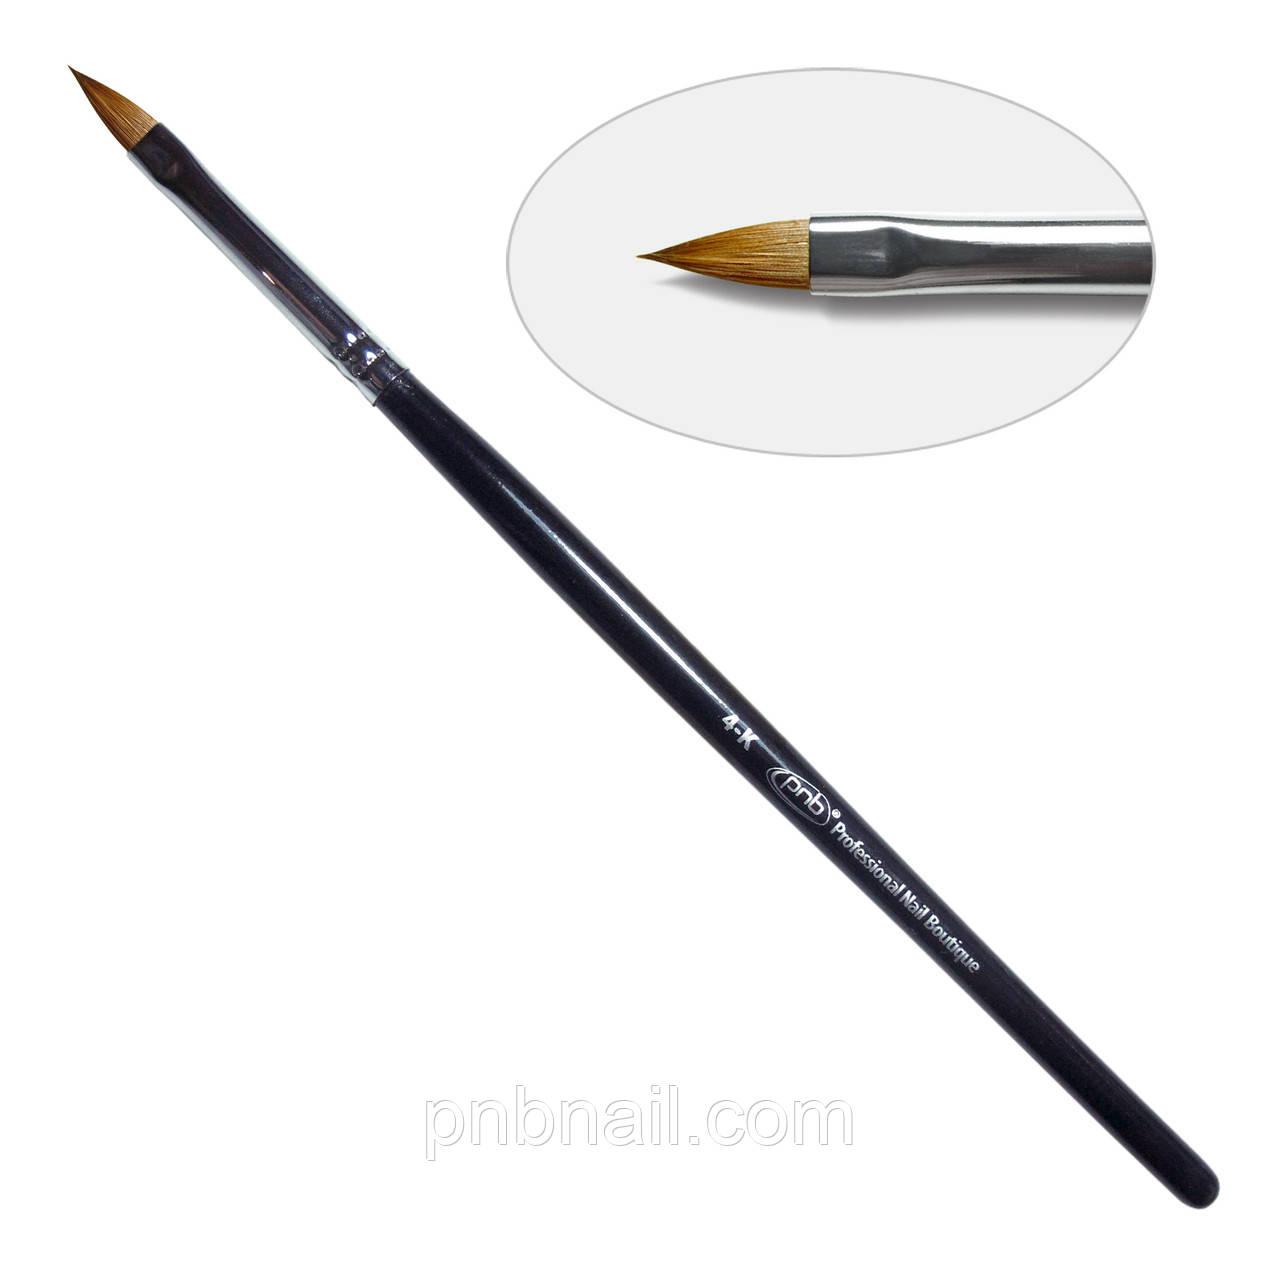 4G. Кисть для геля лепесток 4-к PNB, колонок/Gel Brush Oval sharp 4-к, kolinsky